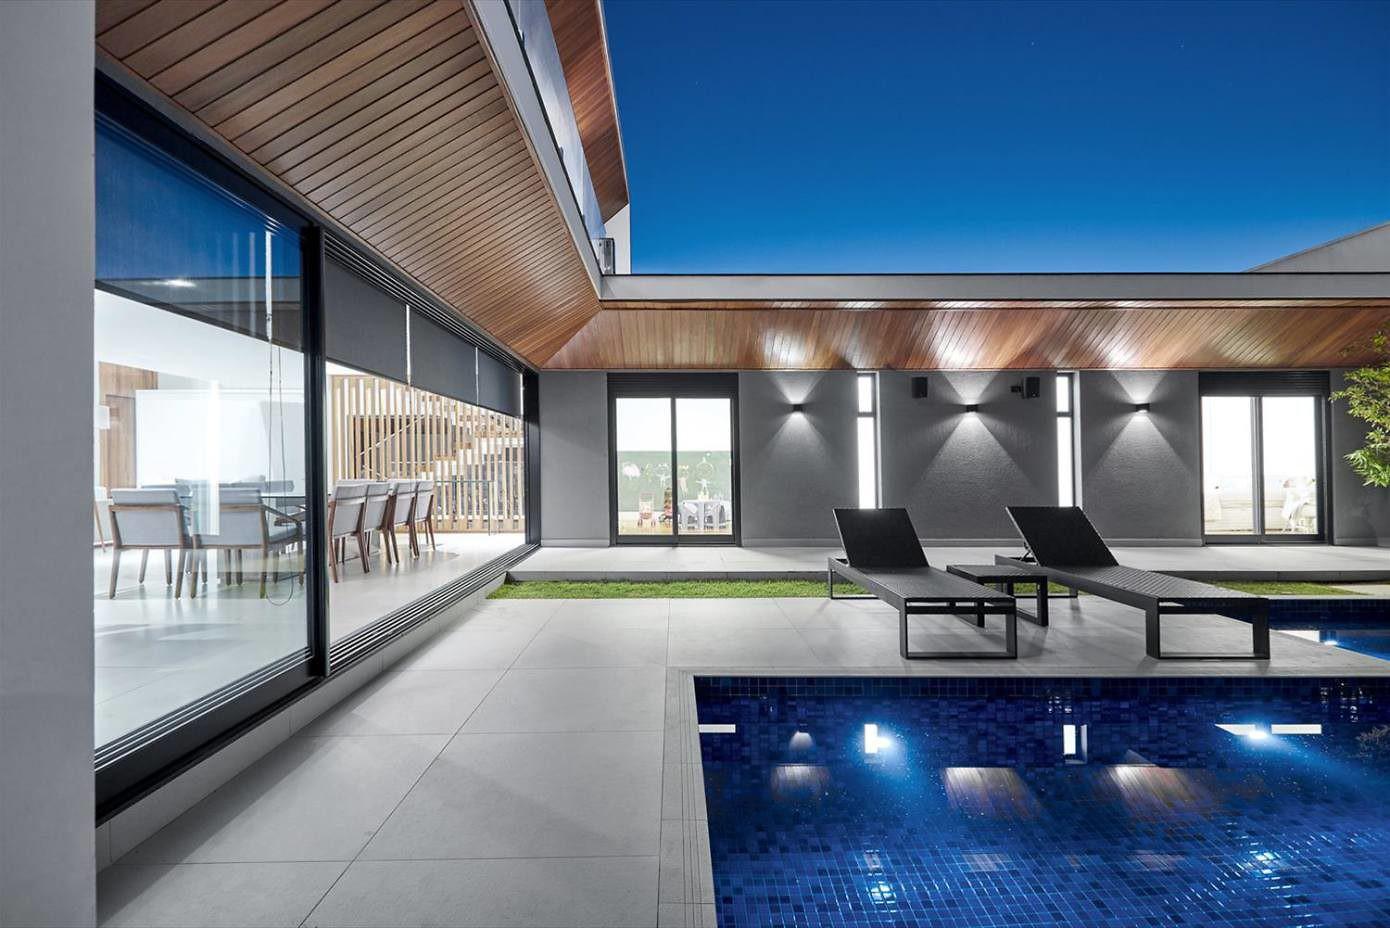 Kyra Residence by Isabela Gasser